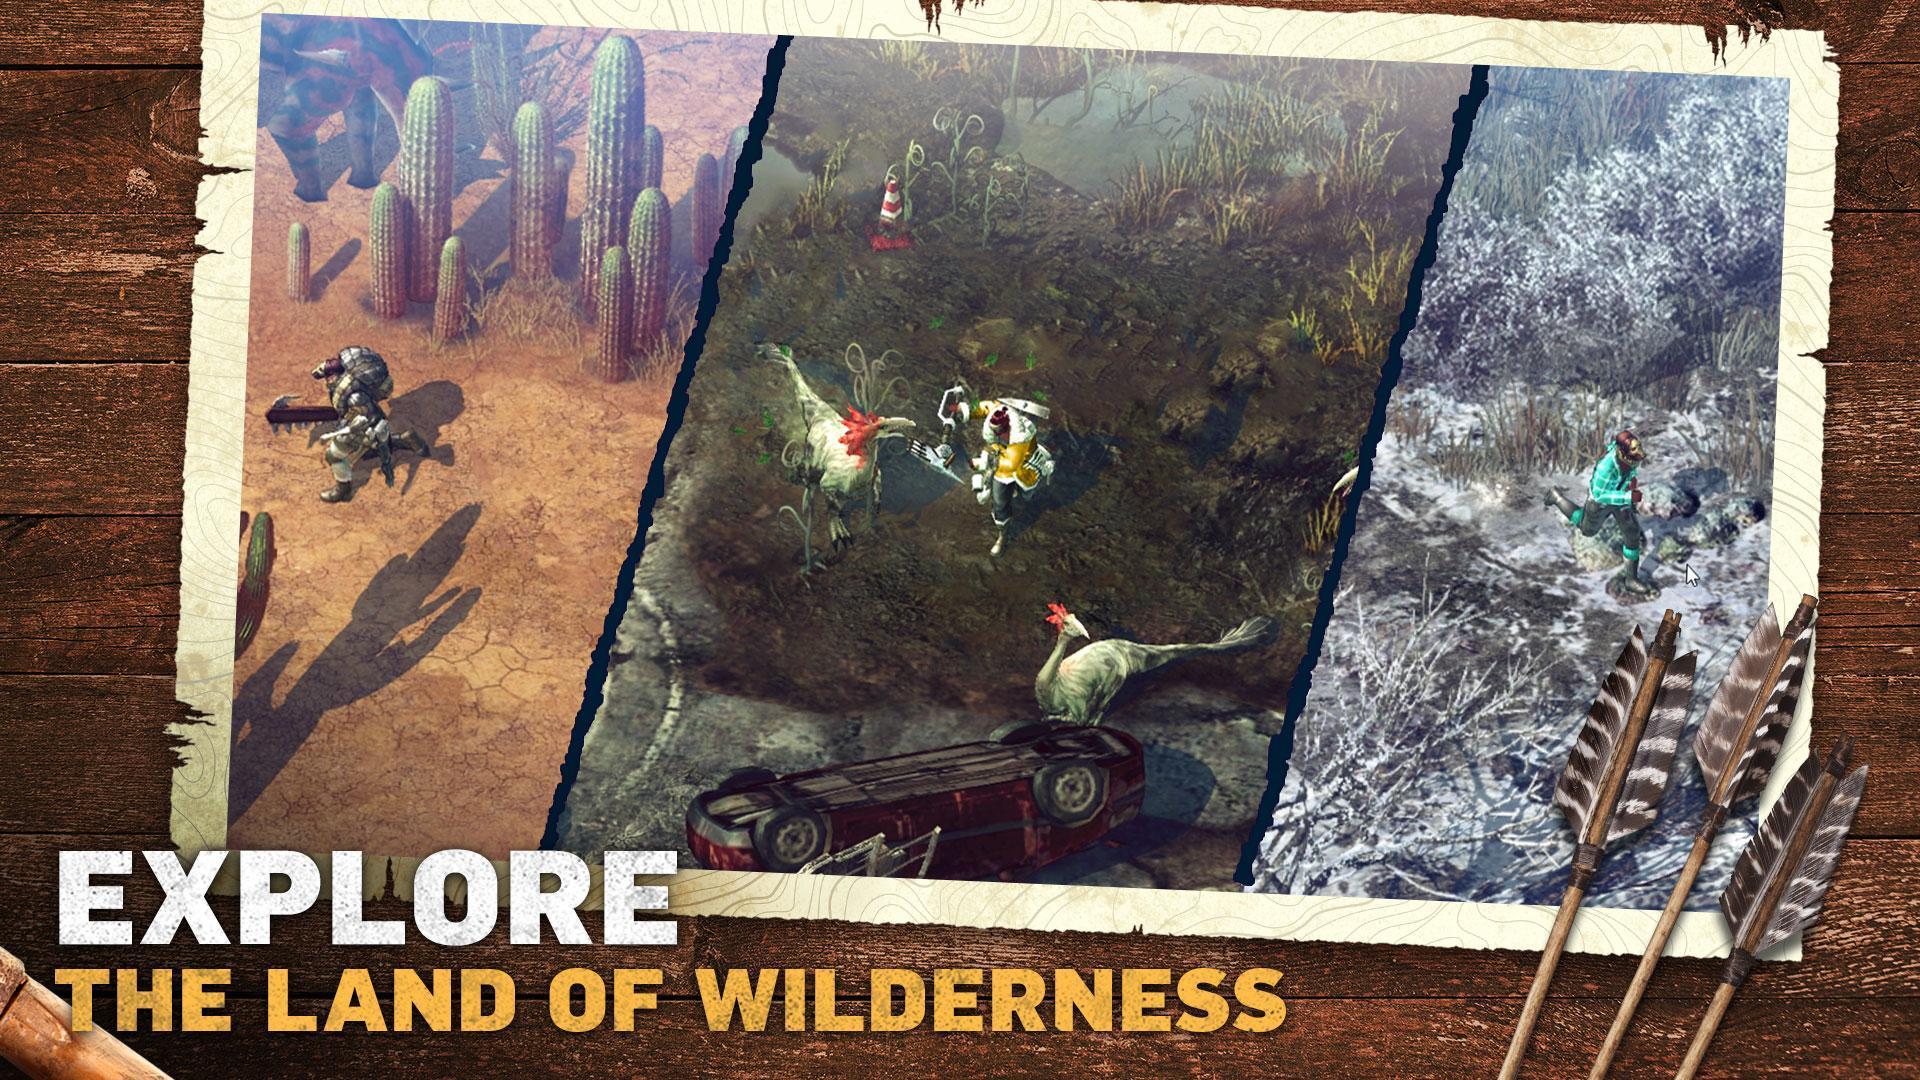 Durango: Wild Lands 5.1.1+1912061543 Screenshot 20